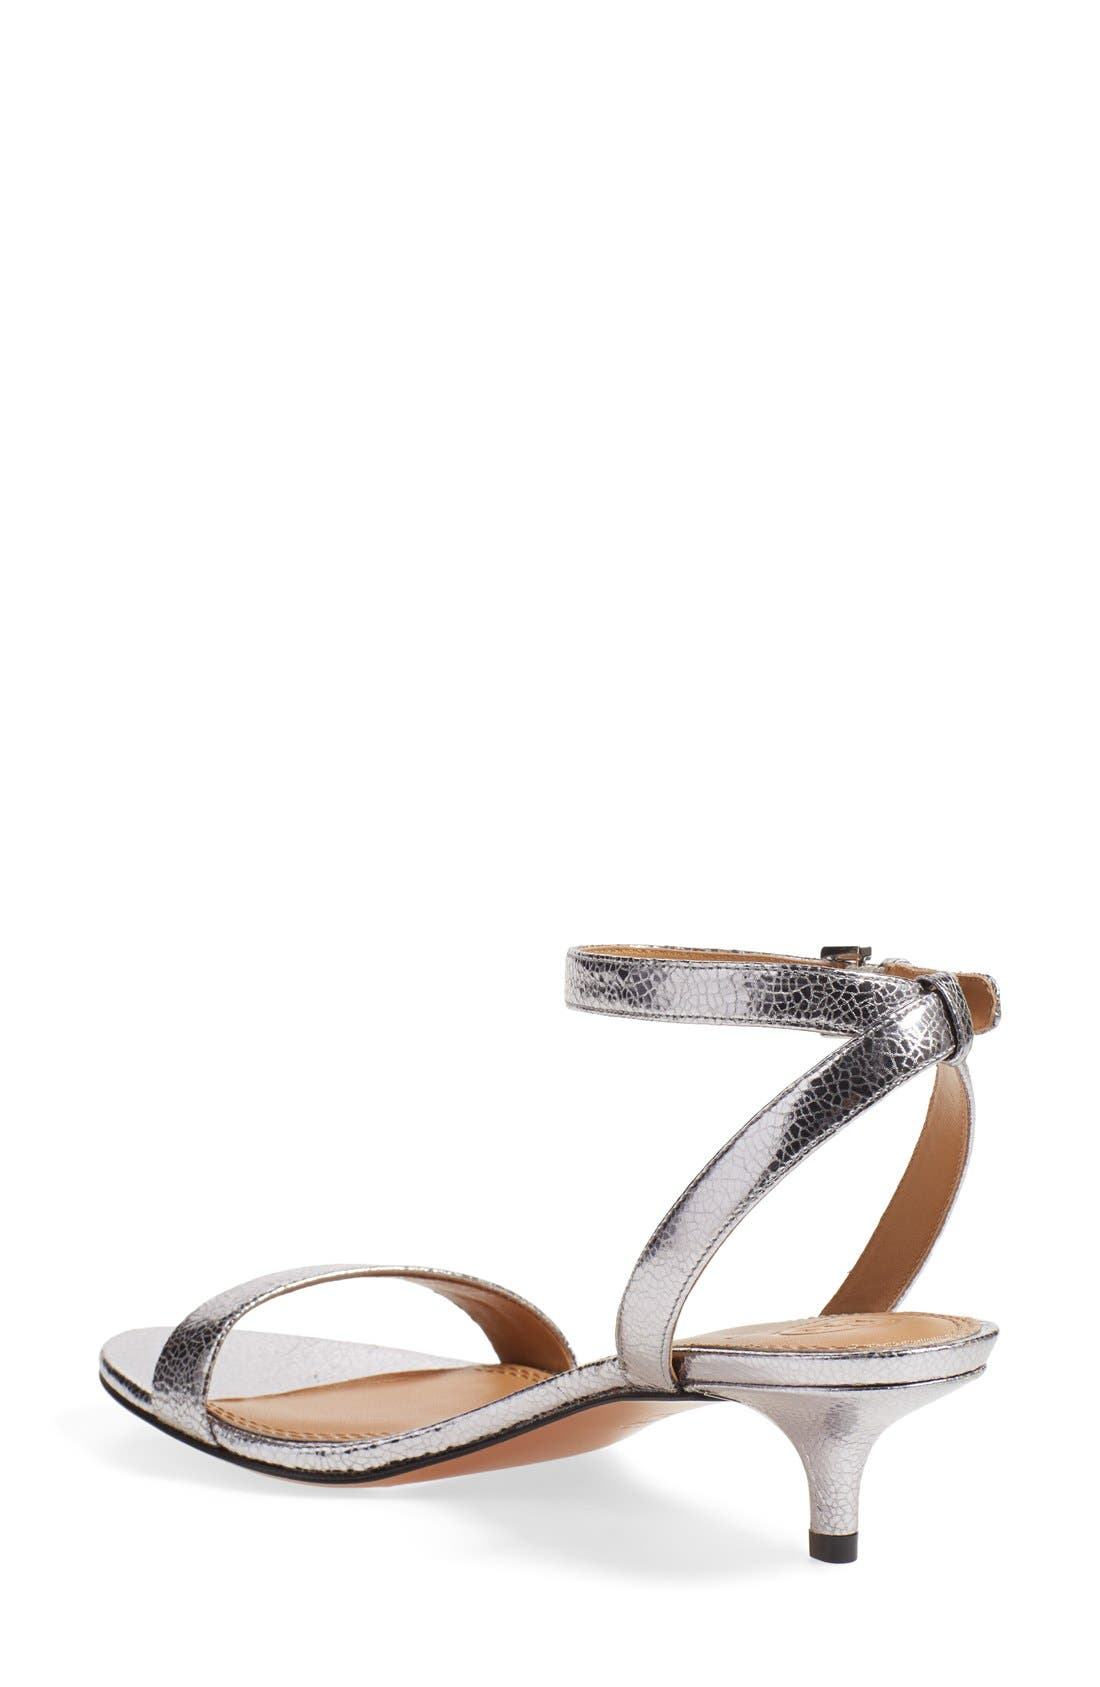 'Elana' Ankle Strap Sandal,                             Alternate thumbnail 2, color,                             043